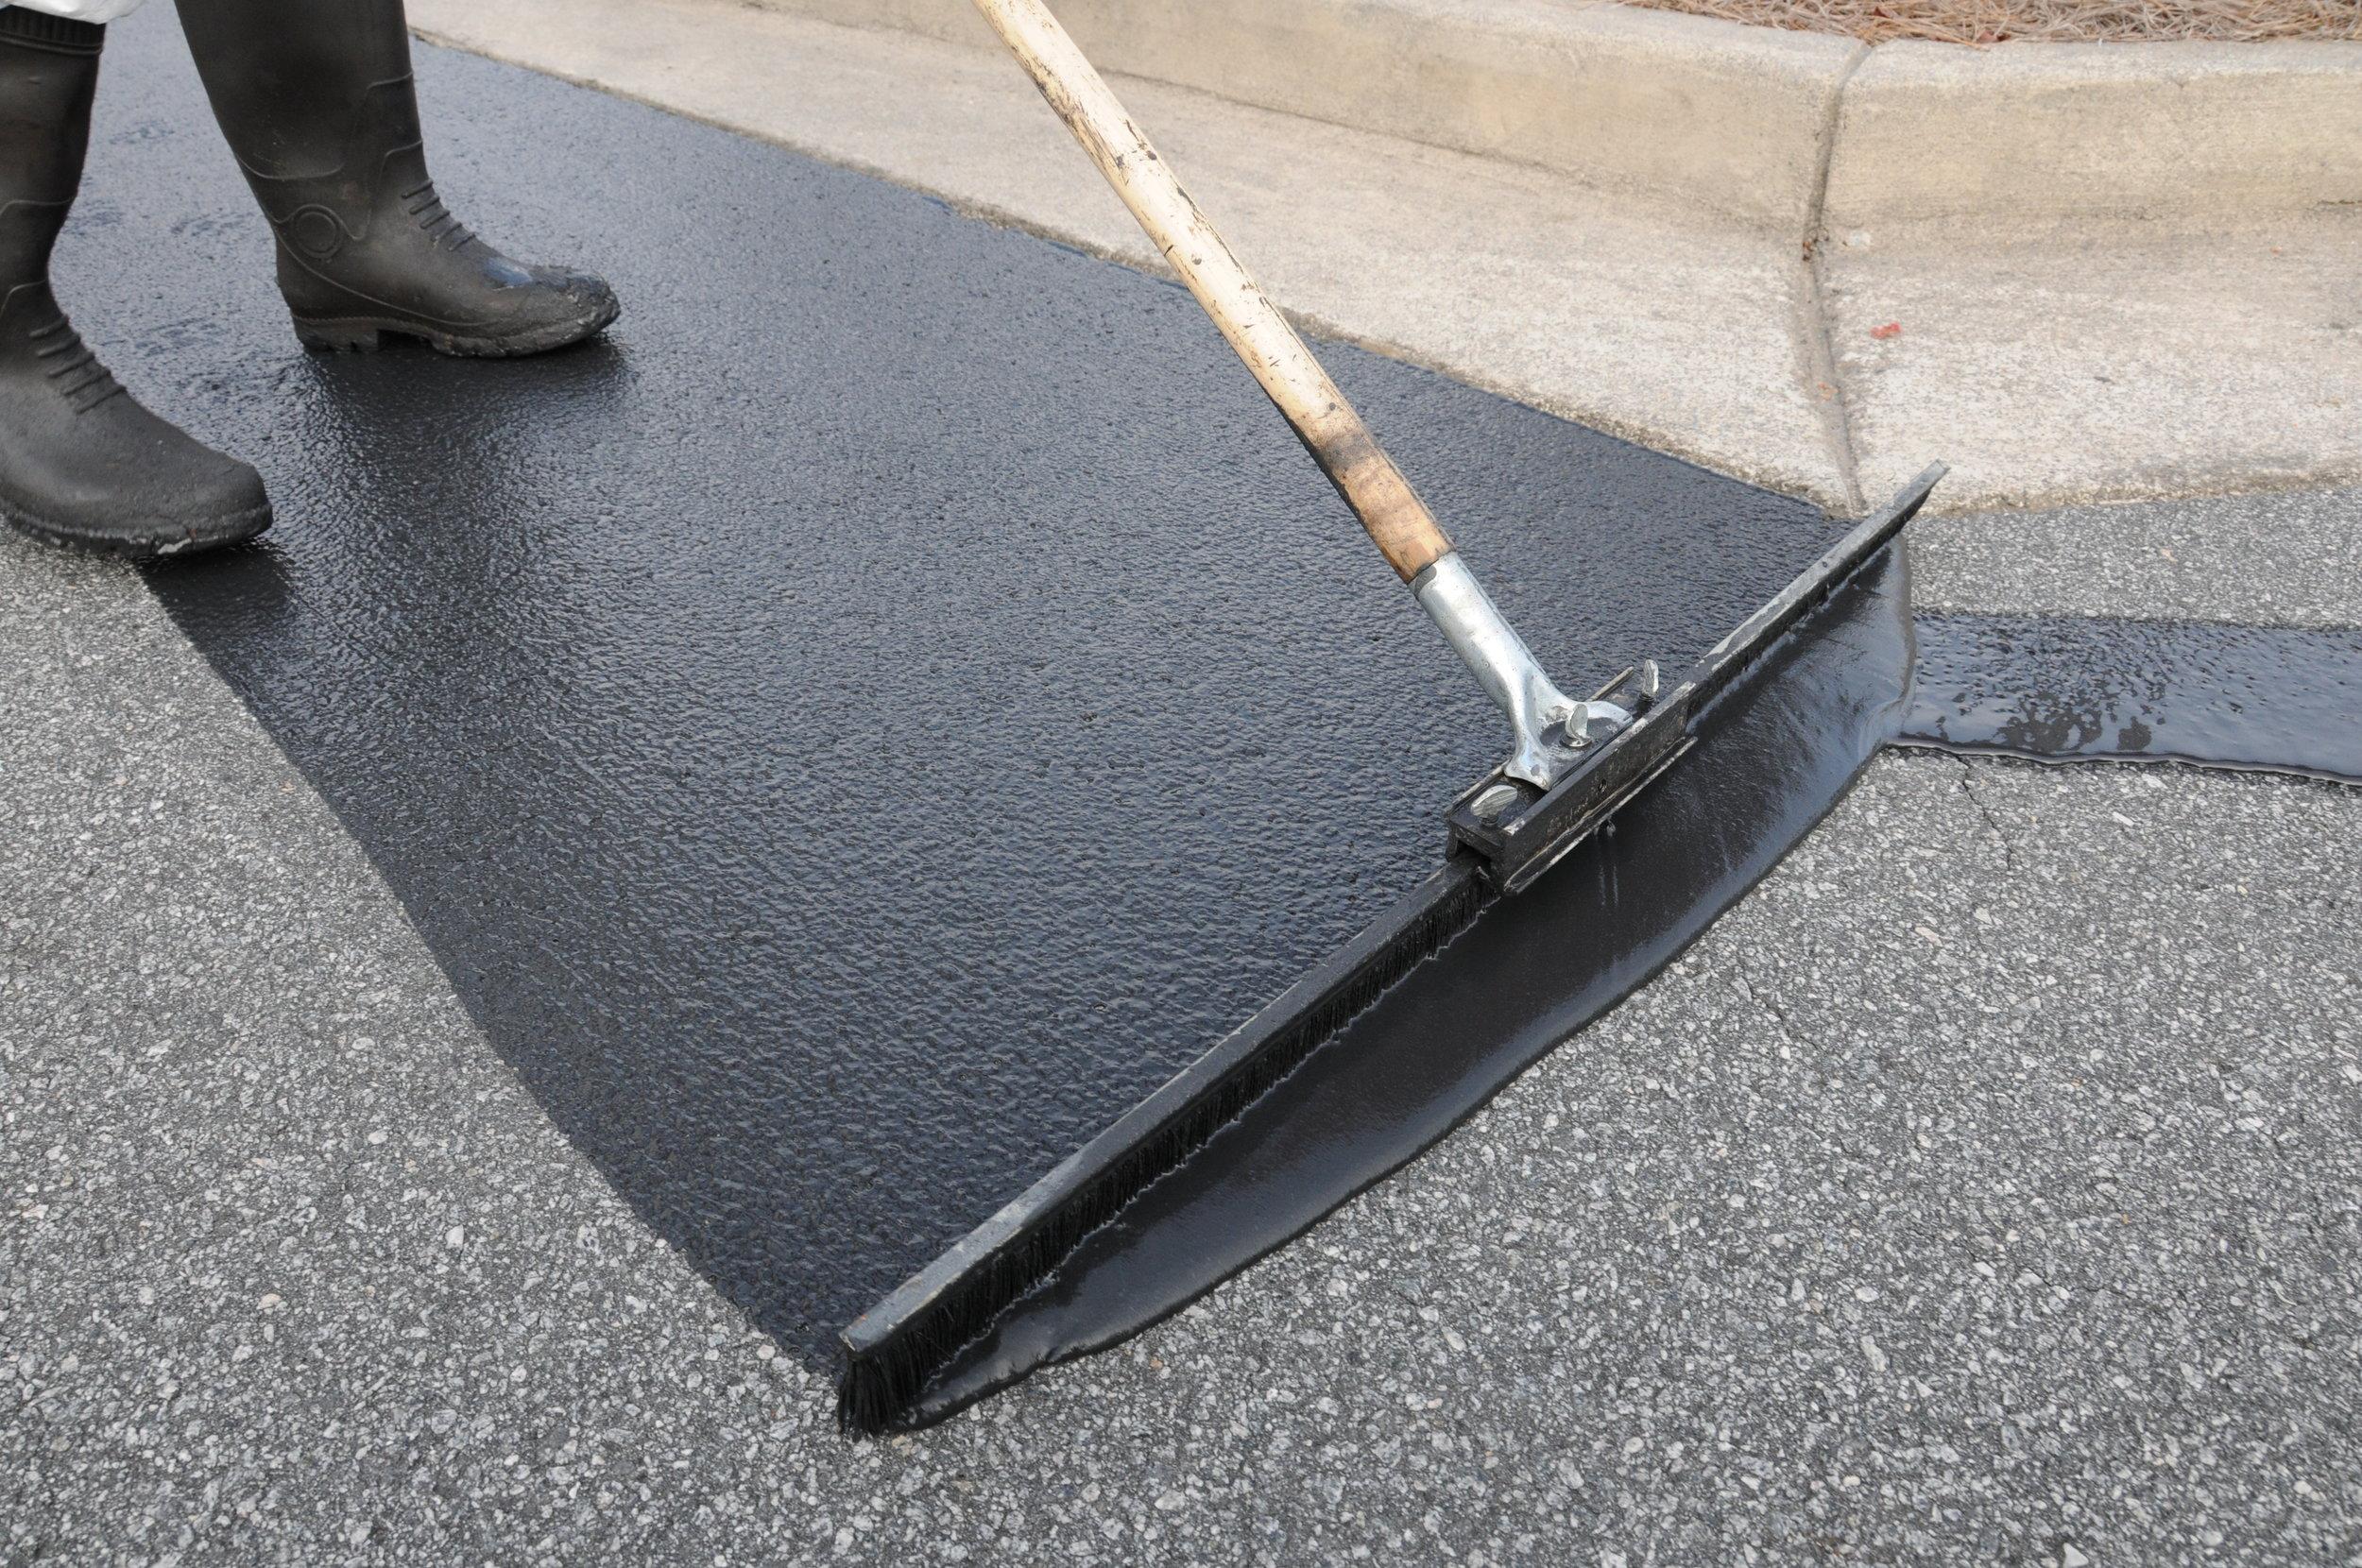 seal-coating-asphalt-pavement.jpg